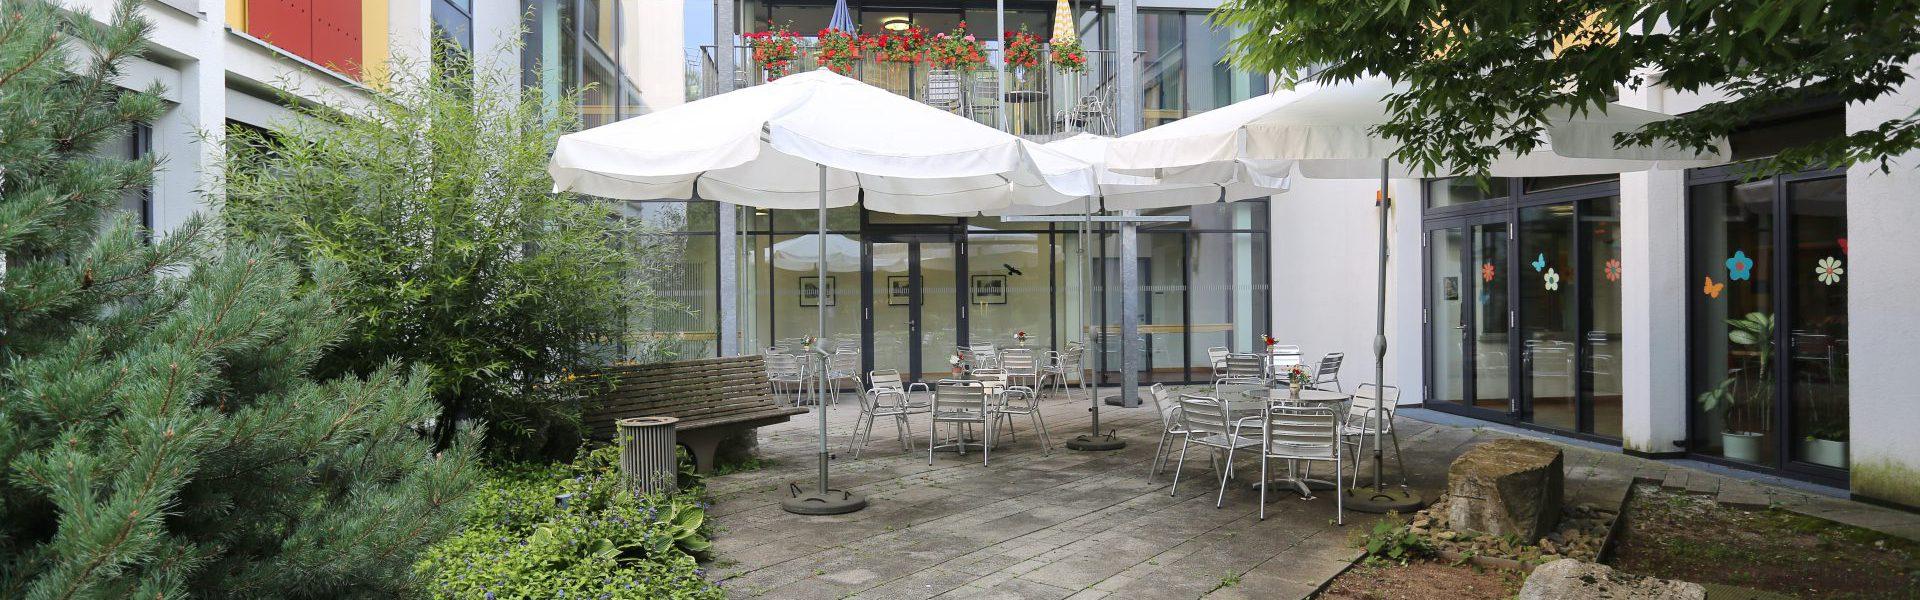 st-josefshaus-frankfurt